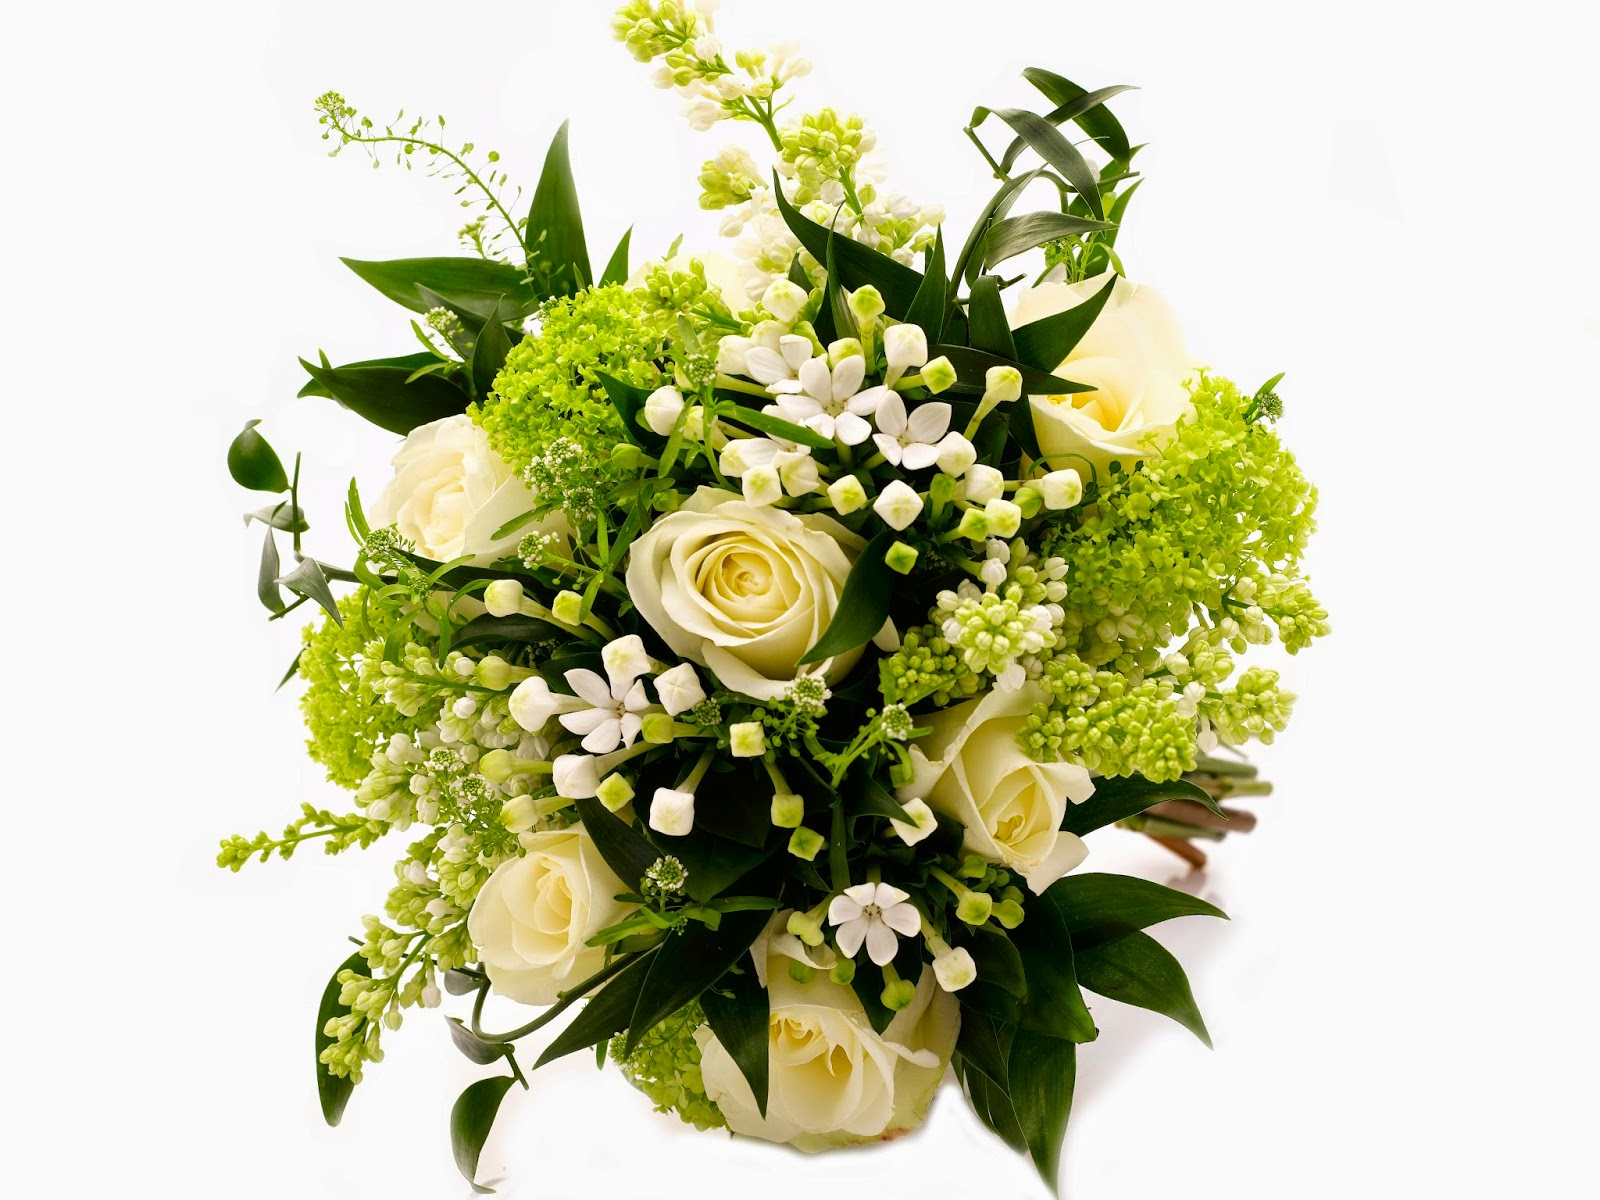 beautiful wedding flower png. Black Bedroom Furniture Sets. Home Design Ideas